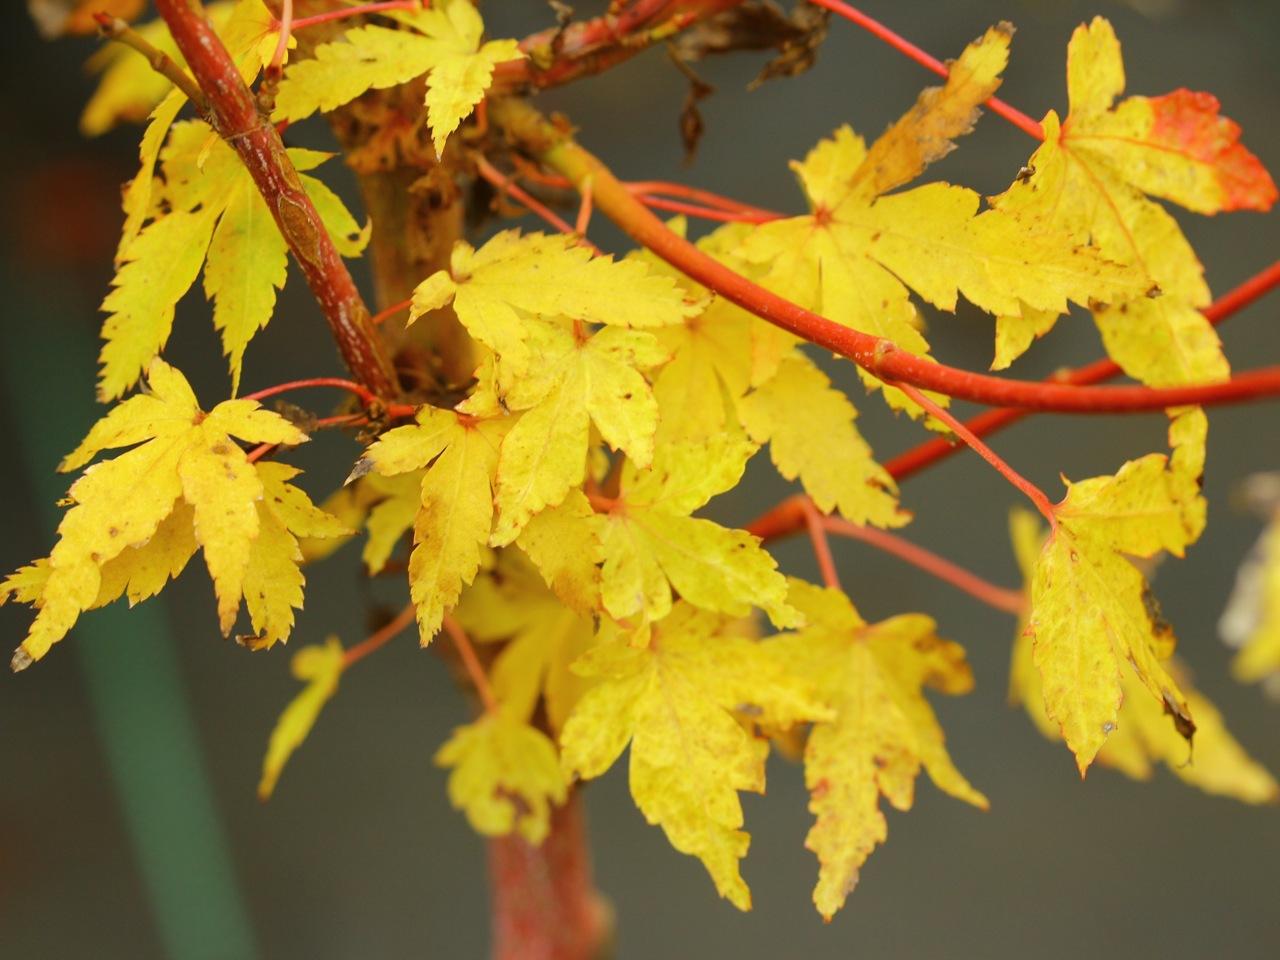 Acer-palmatum-Aka-kawa-hime-Japanese-maple-coral-bark-red-twig